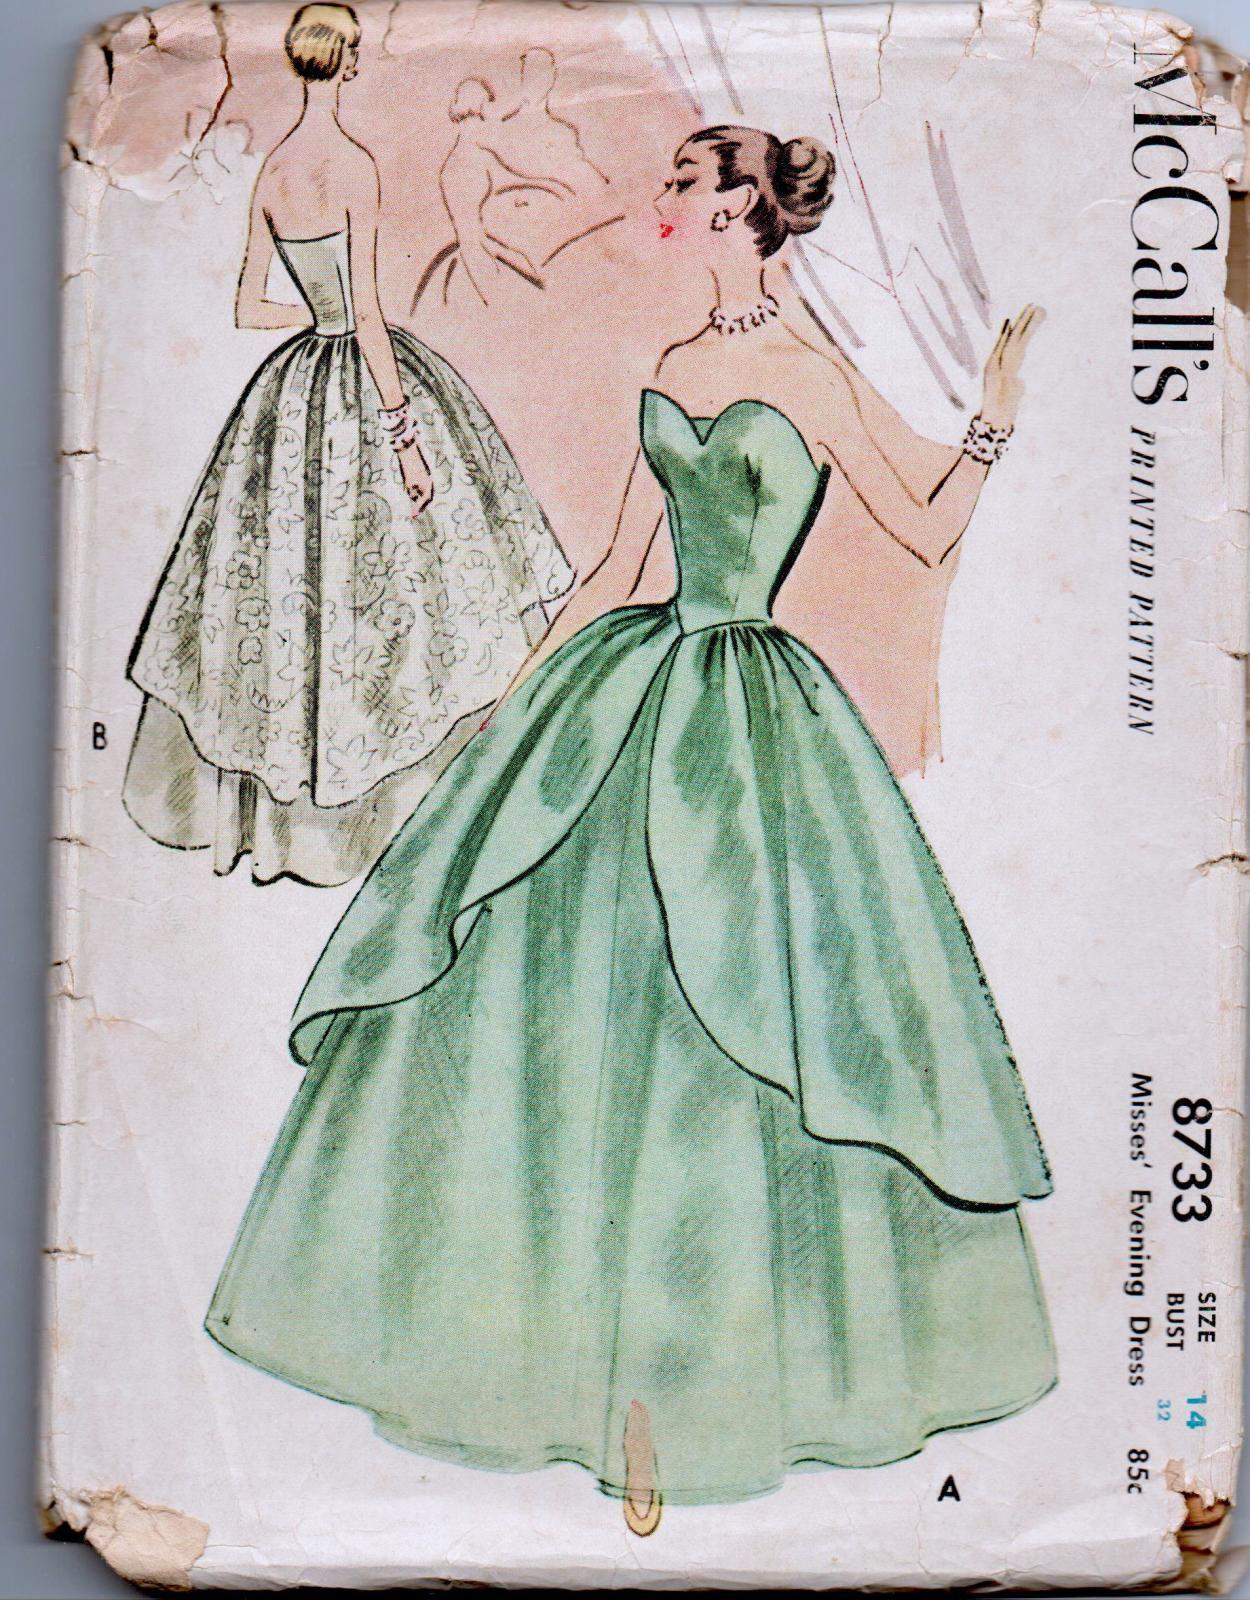 Vintage Sewing Patterns for Voluptuous Evening Dress of Earlier Eras